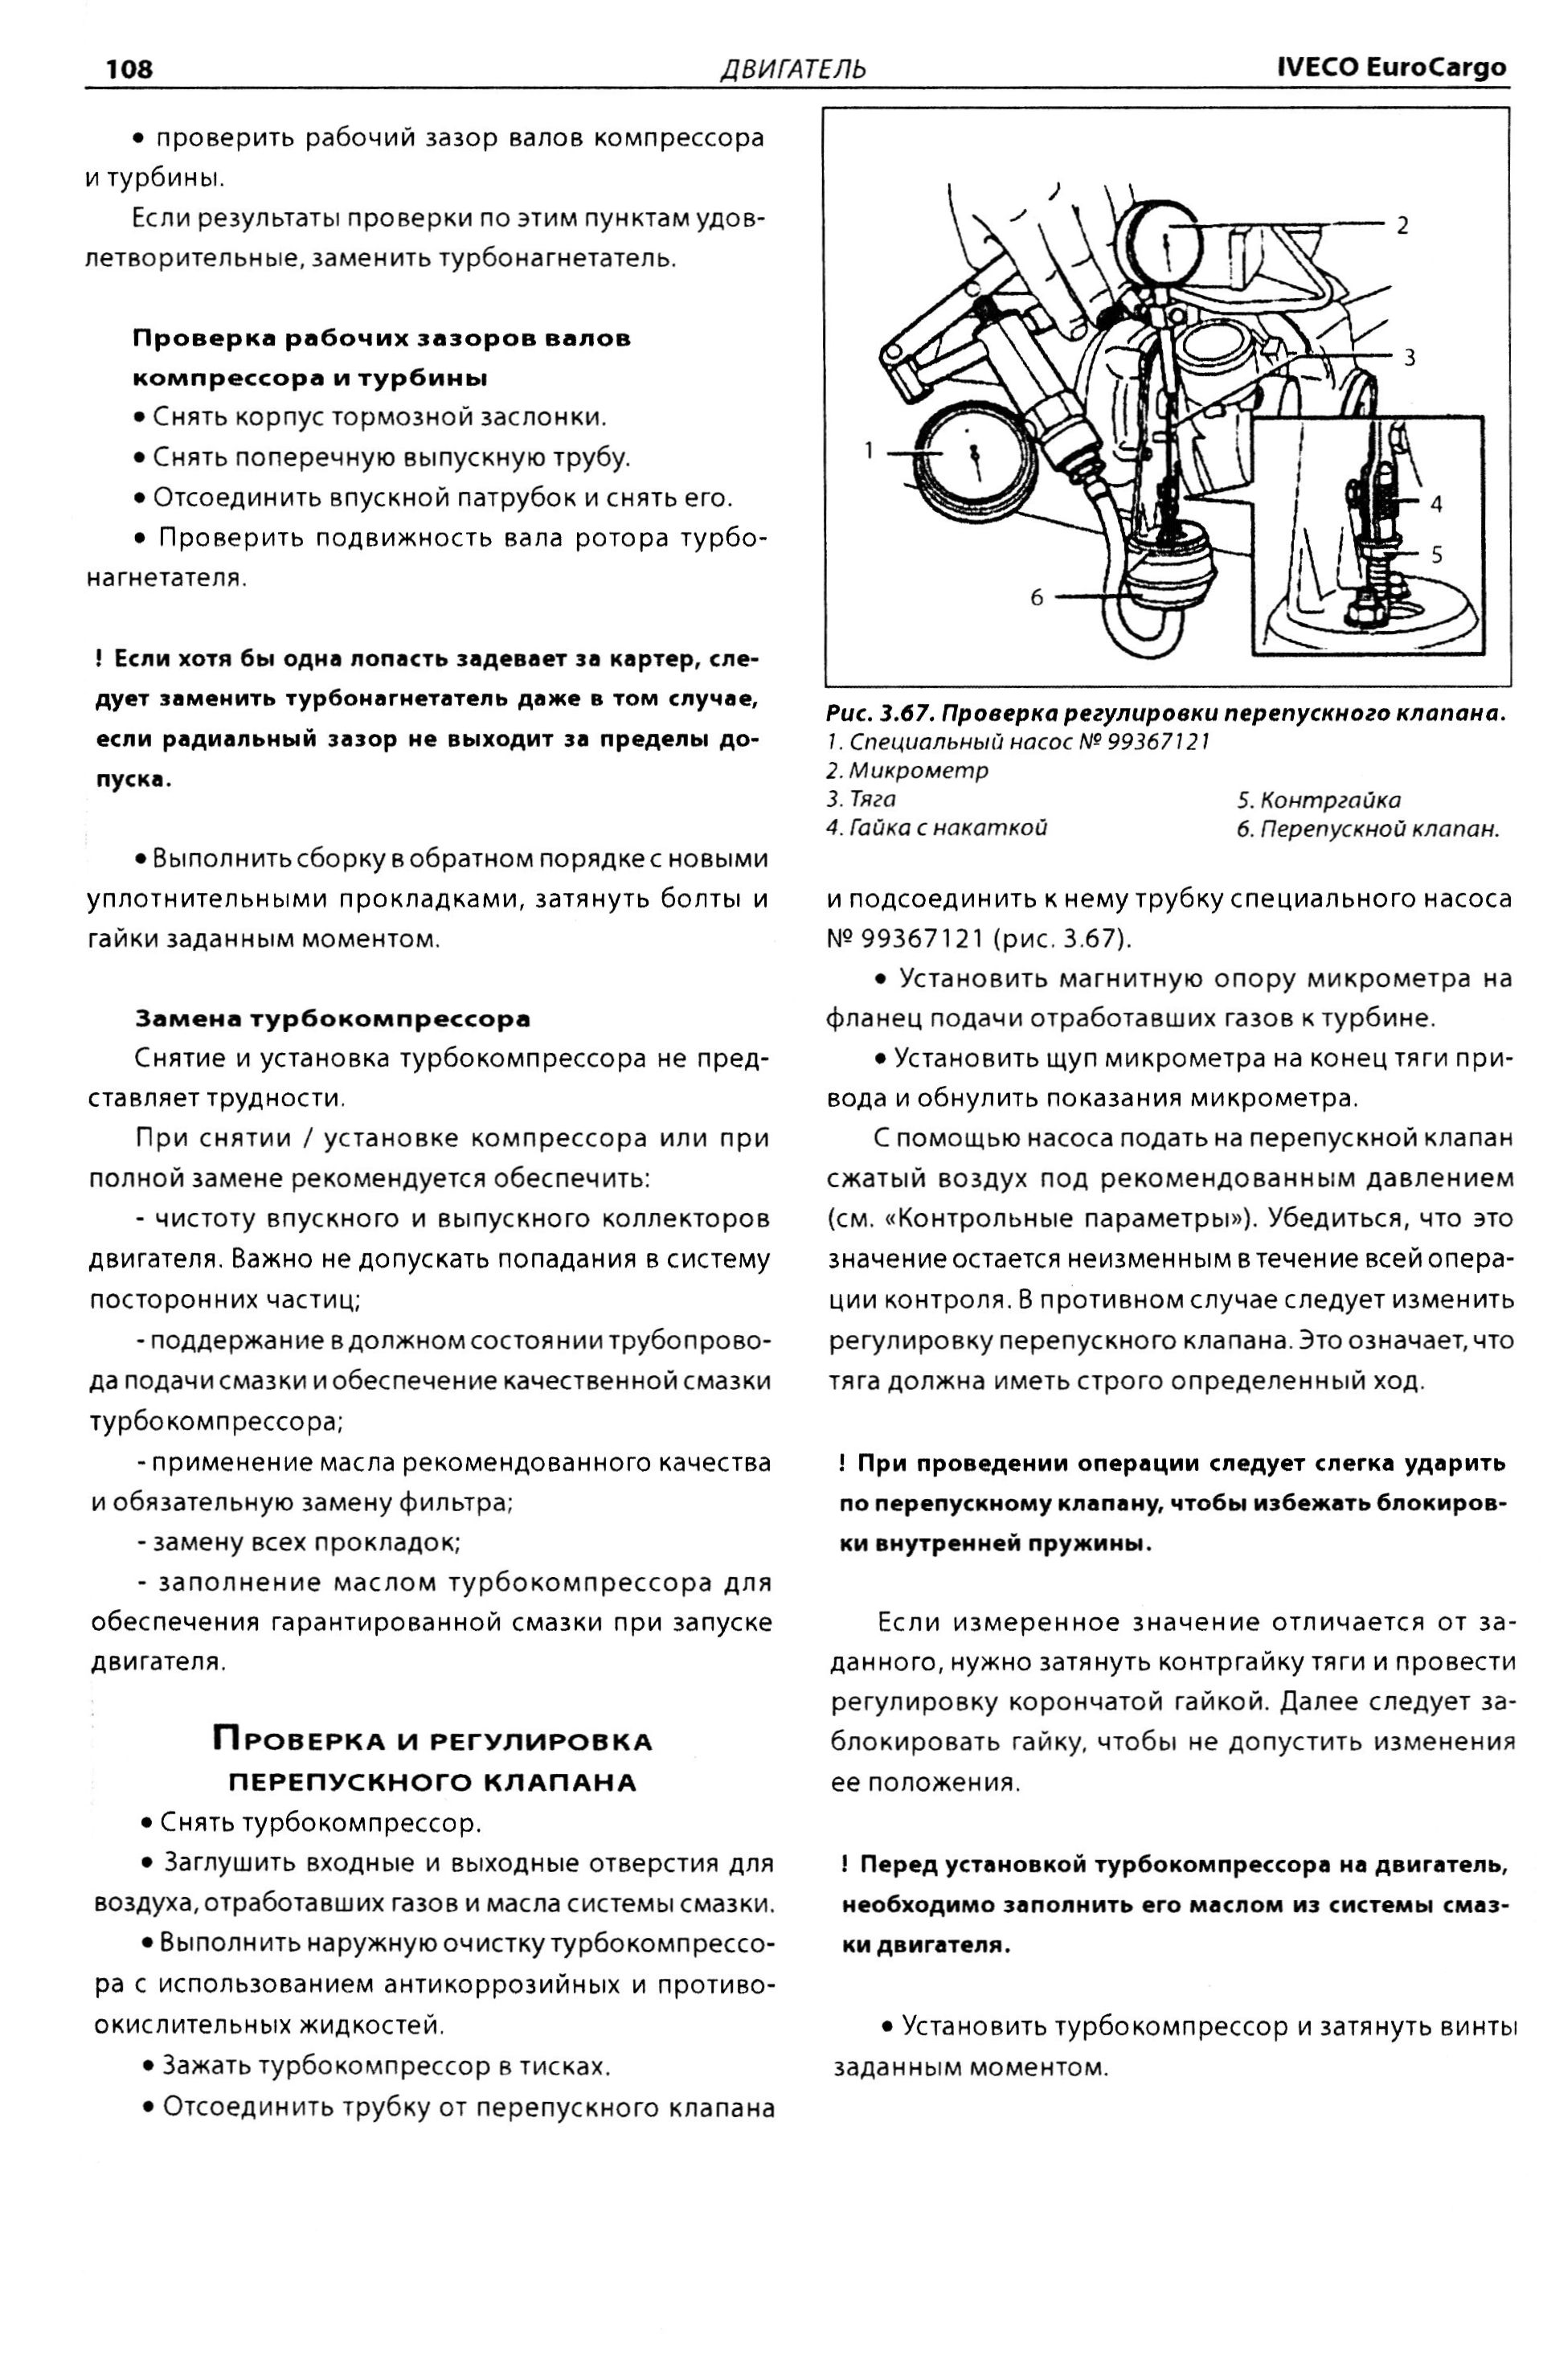 пошаговая схема регулировки клапанов на камазе